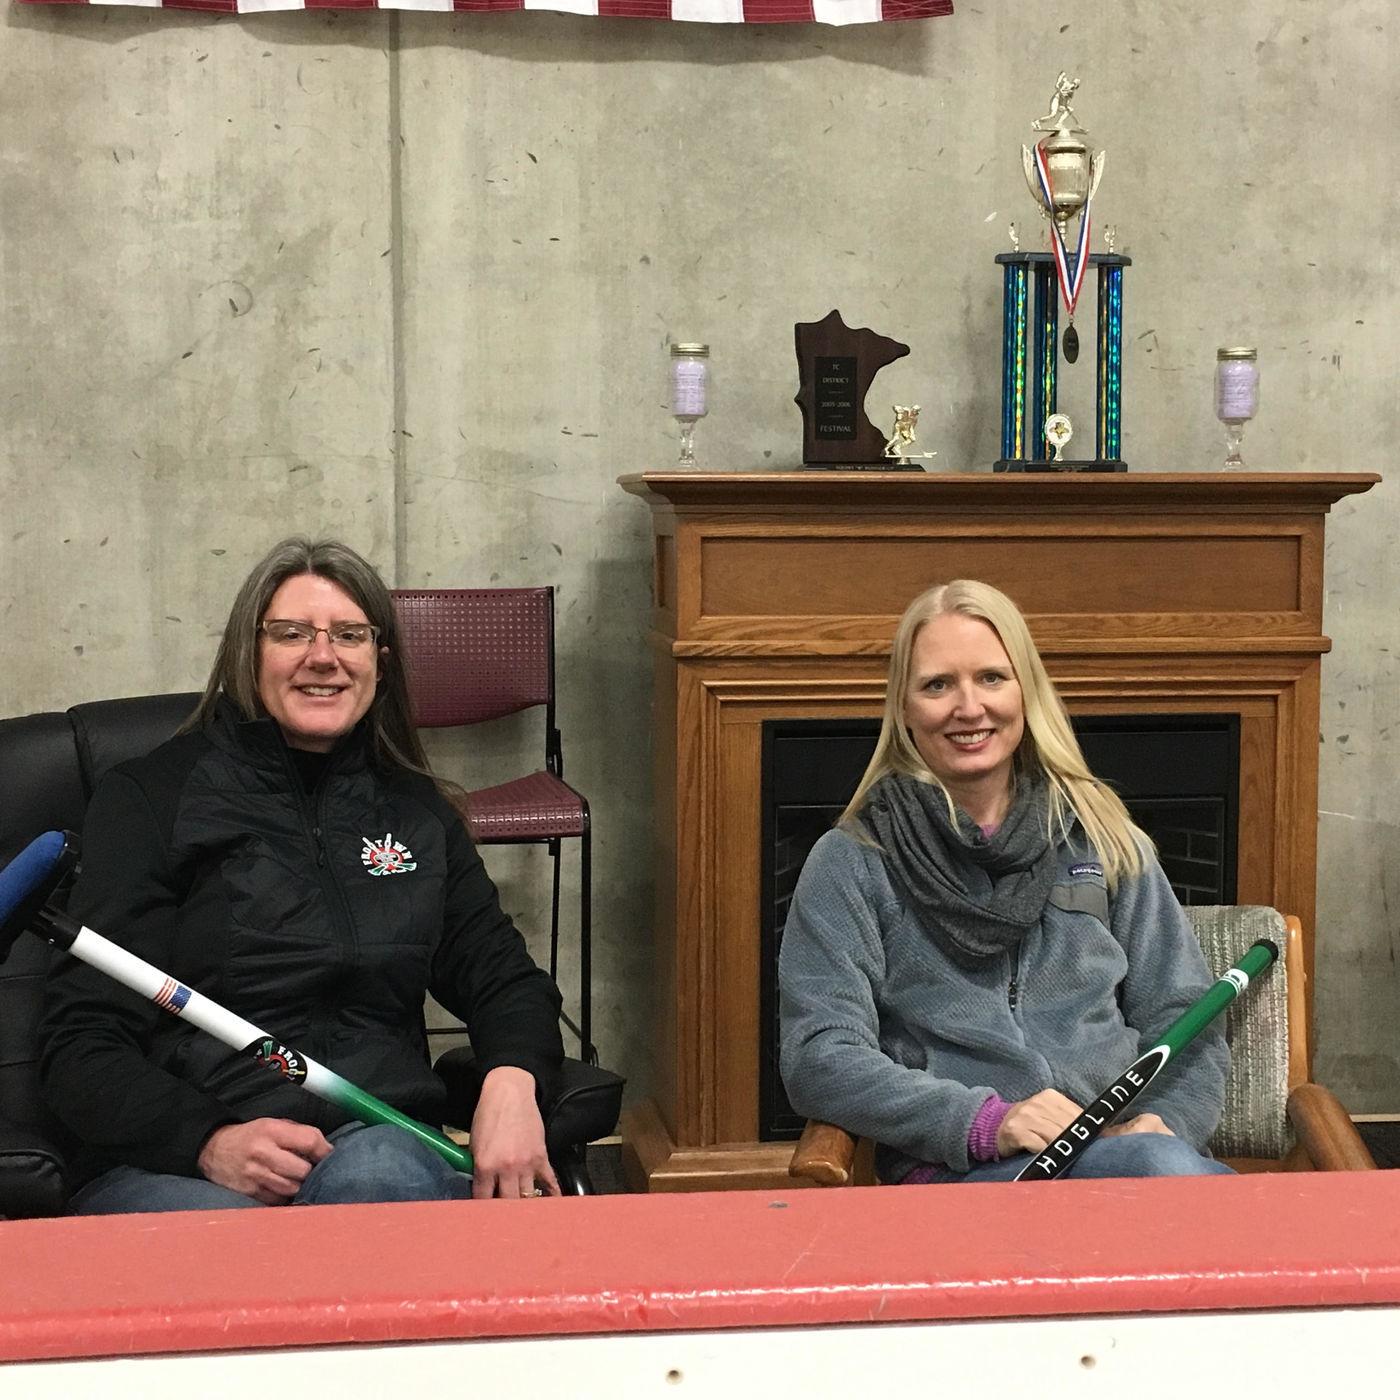 Ep. 21 - Amanda Clore and Jessica Erickson